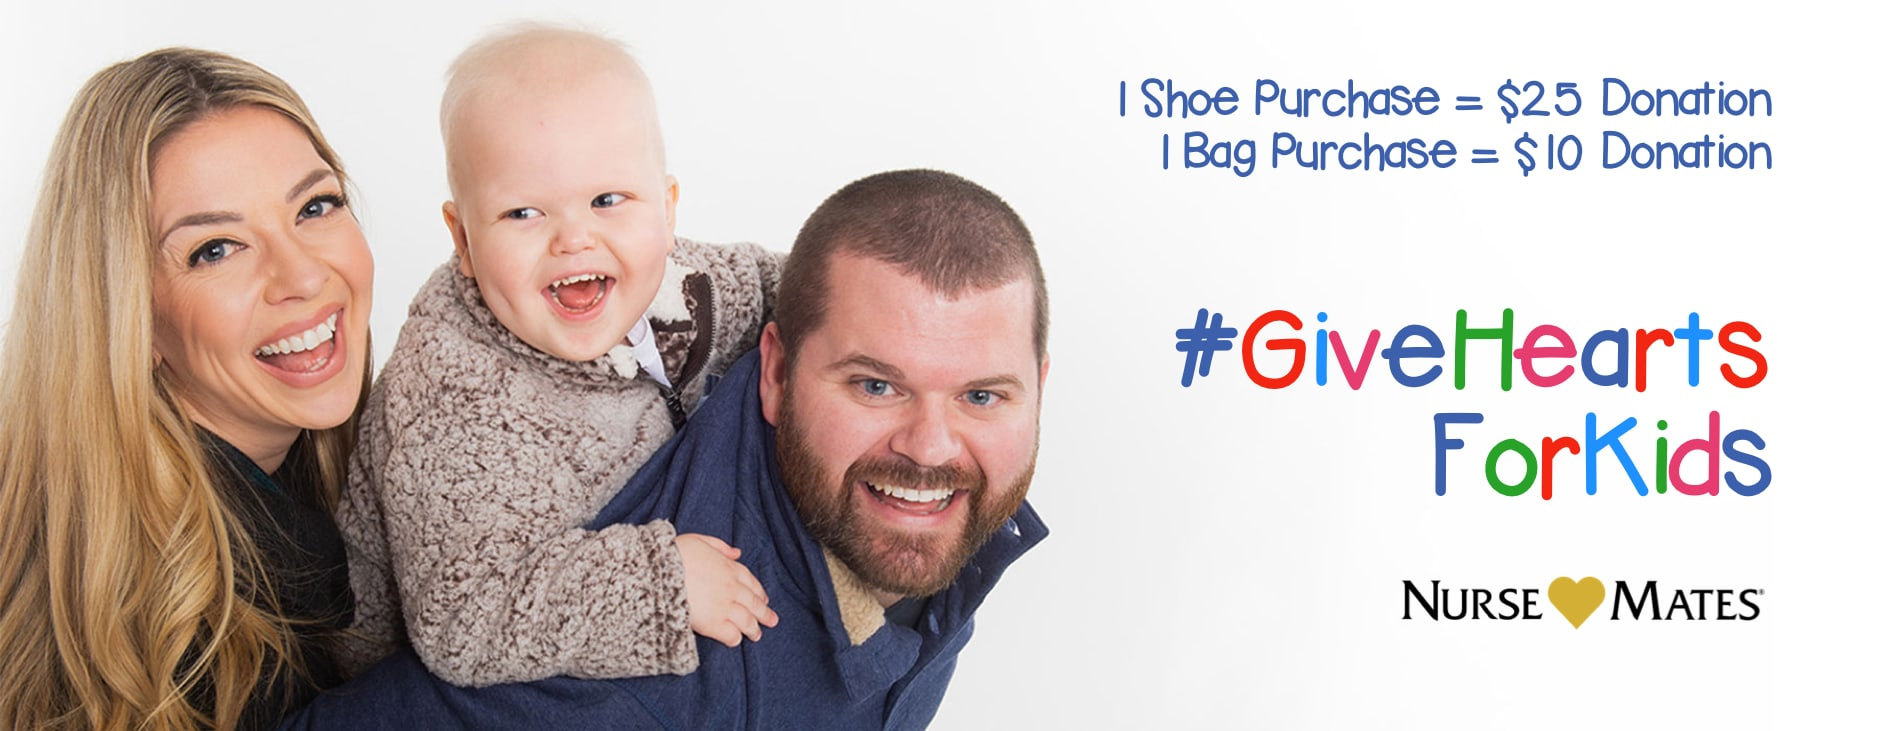 1 Shoe Purchase = $25 Donation. 1 Bag Purchase = $10 Donation. #GiveHeartsForKids. Nurse Mates Logo.